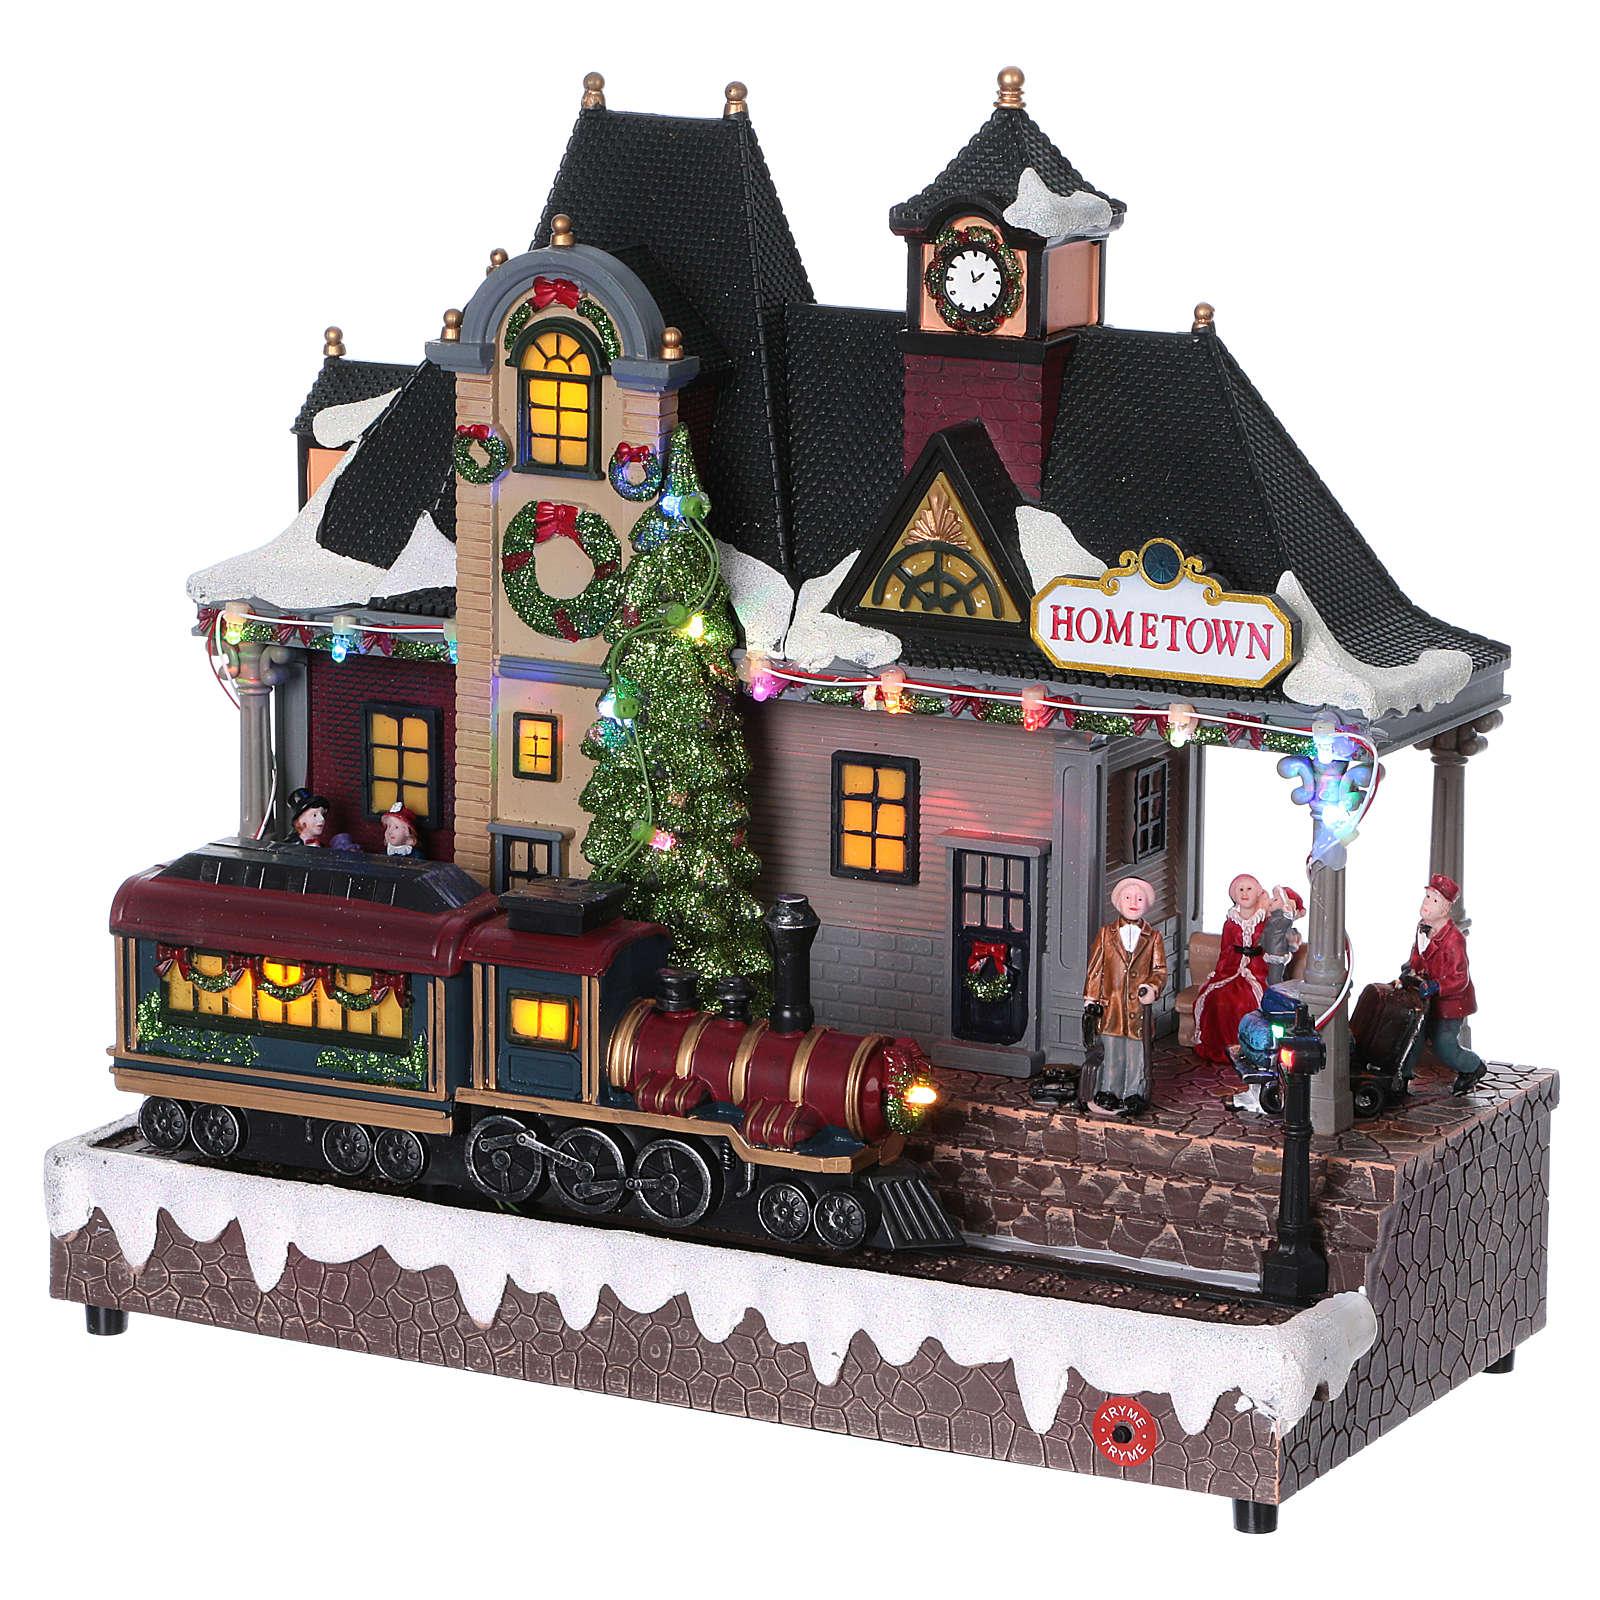 Illuminated and animated Christmas village train station 30x30x15, batteries 3